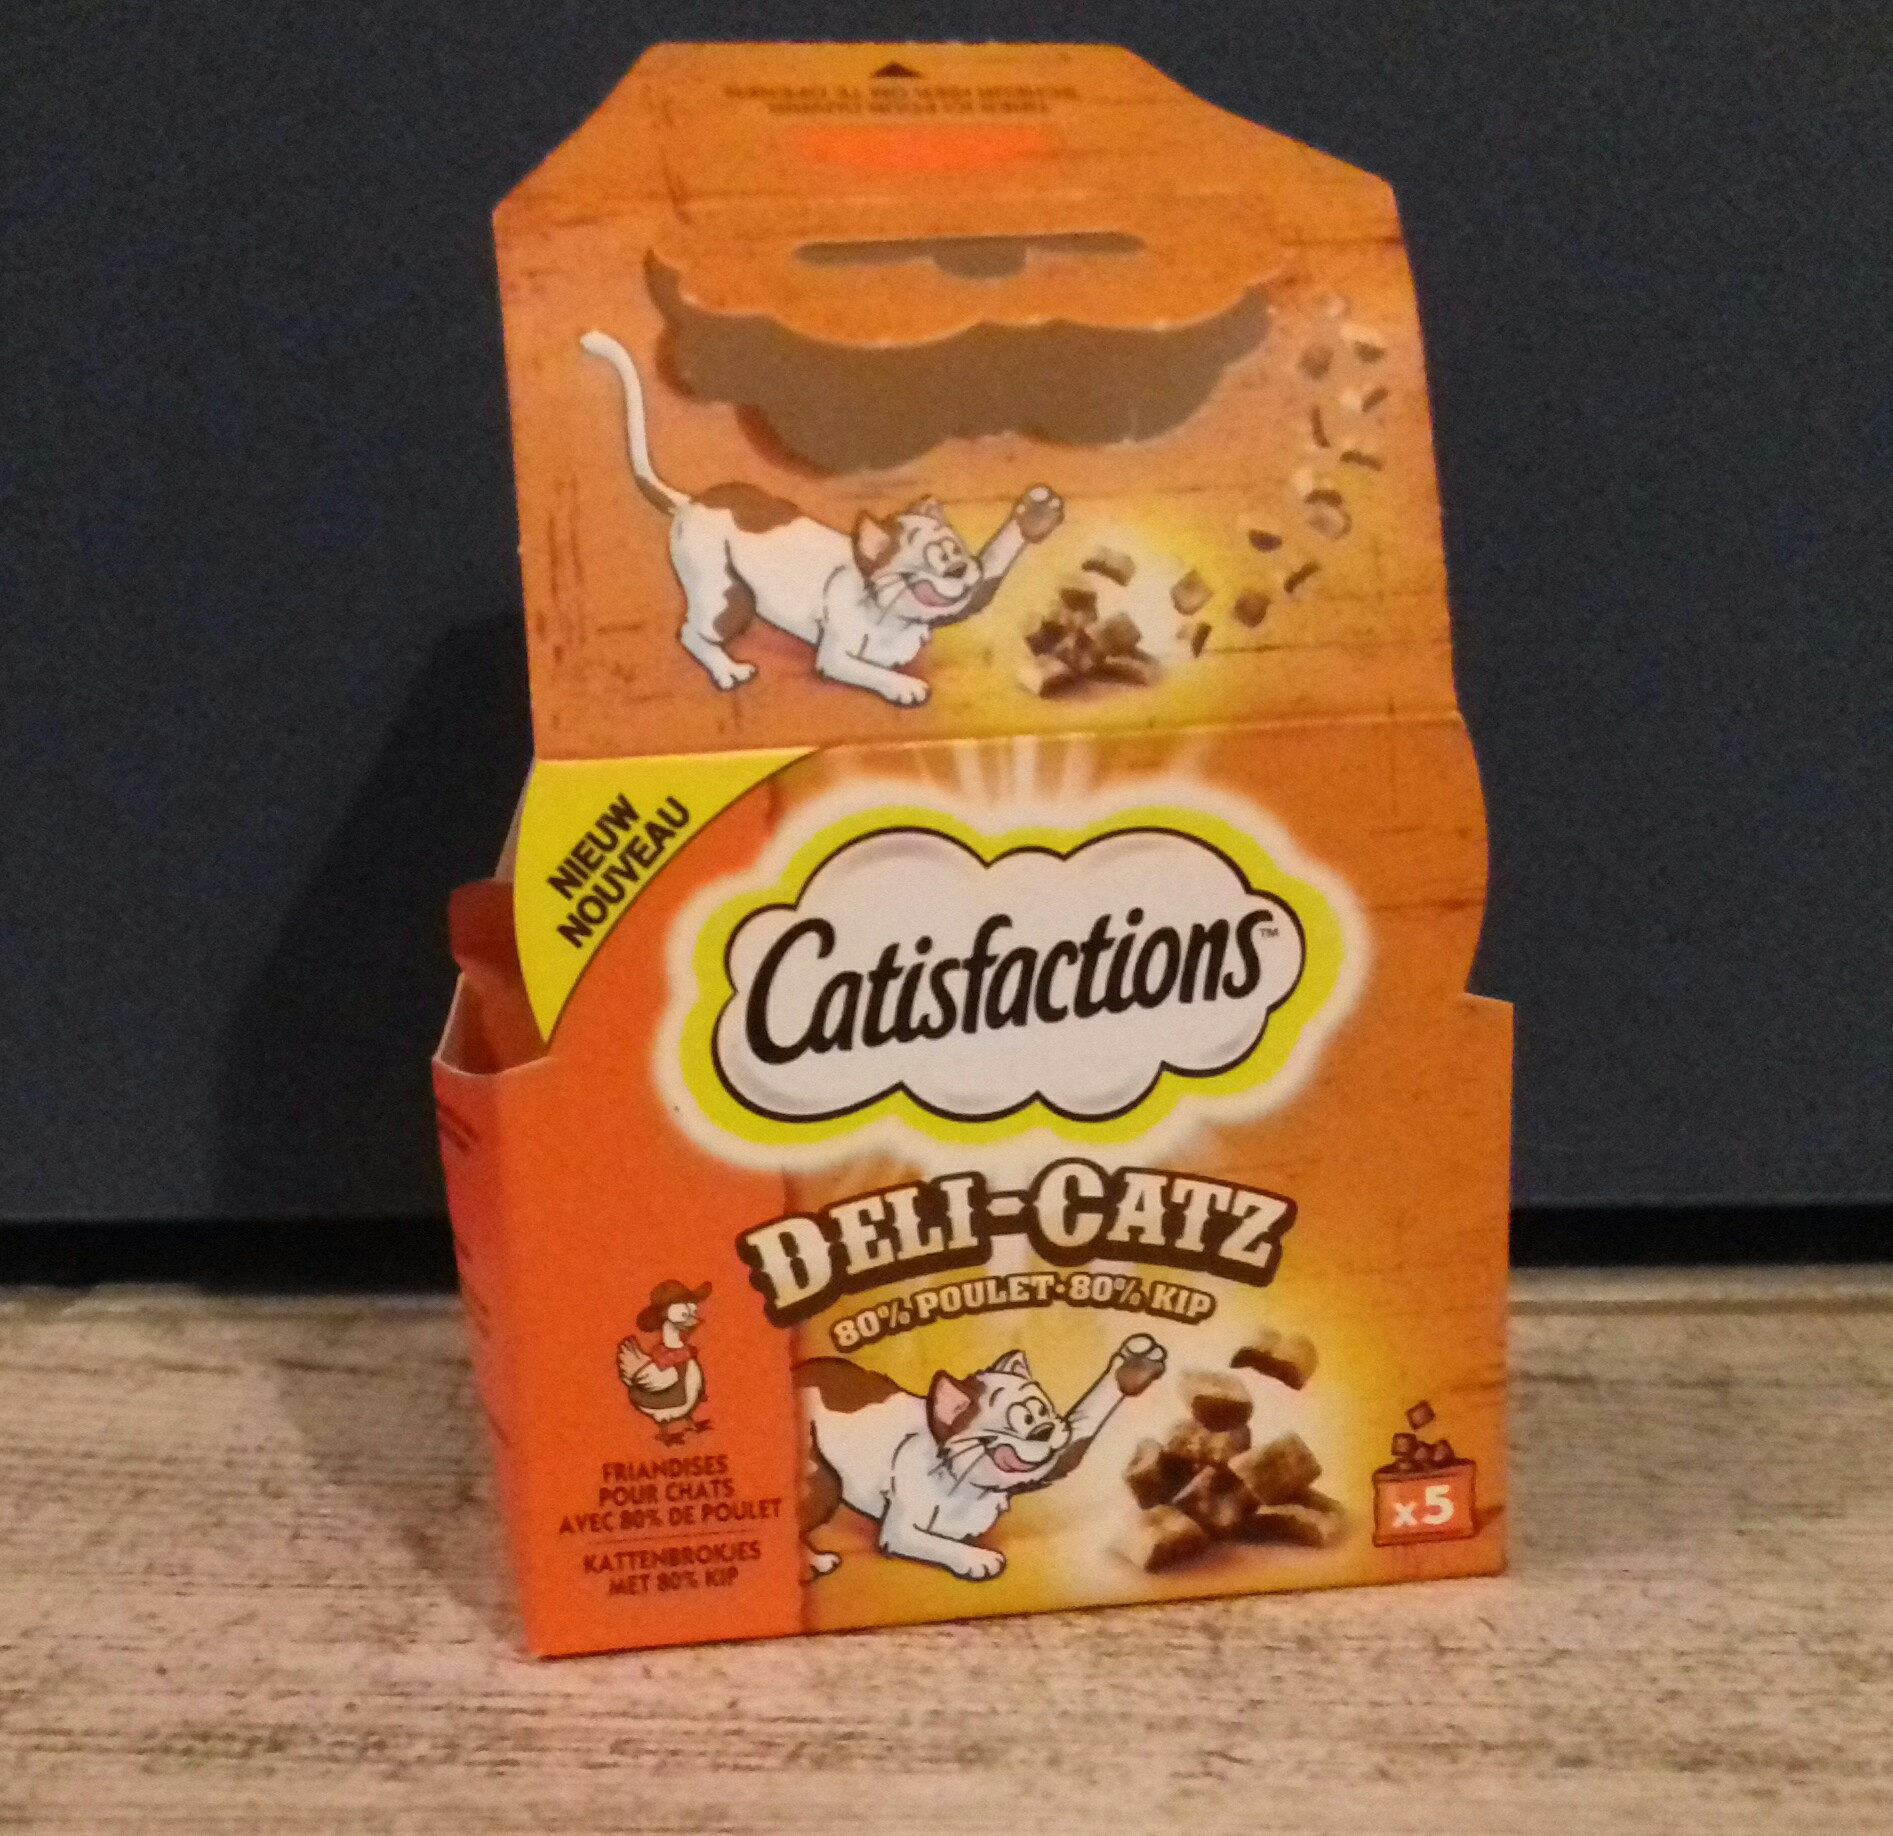 Castisfactions DELI-CATZ - Produit - fr